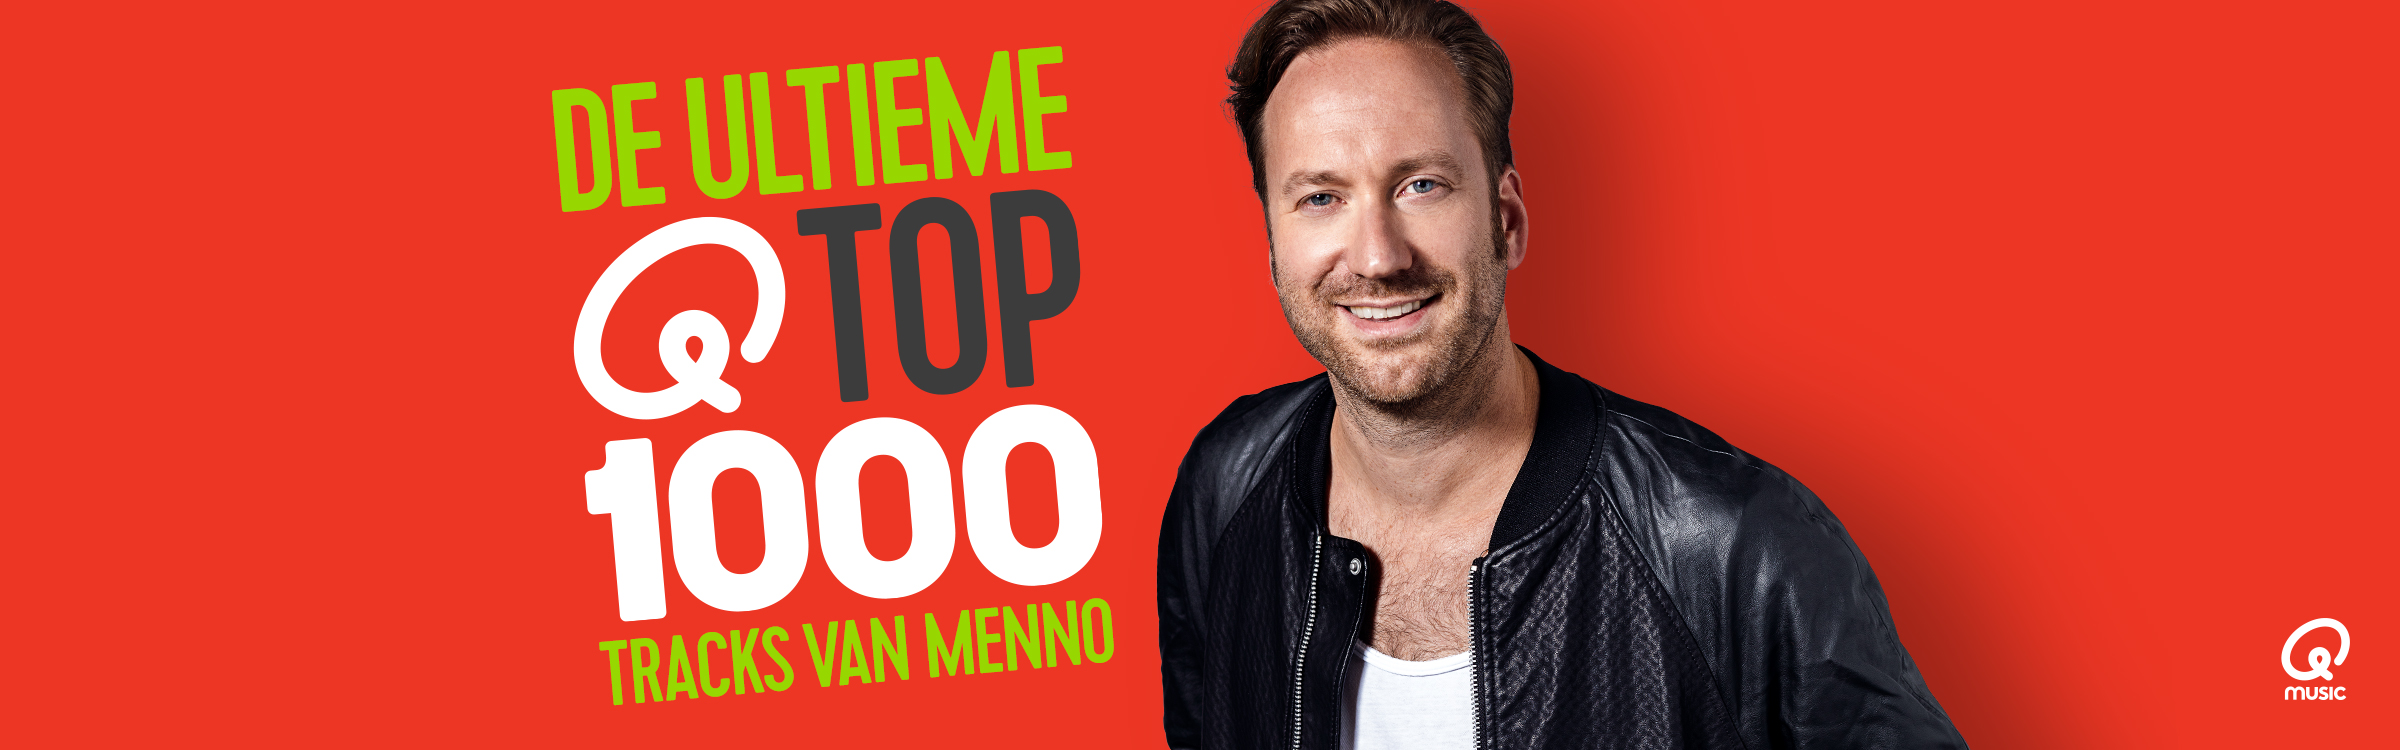 Qmusic actionheader qtop1000 dj menno